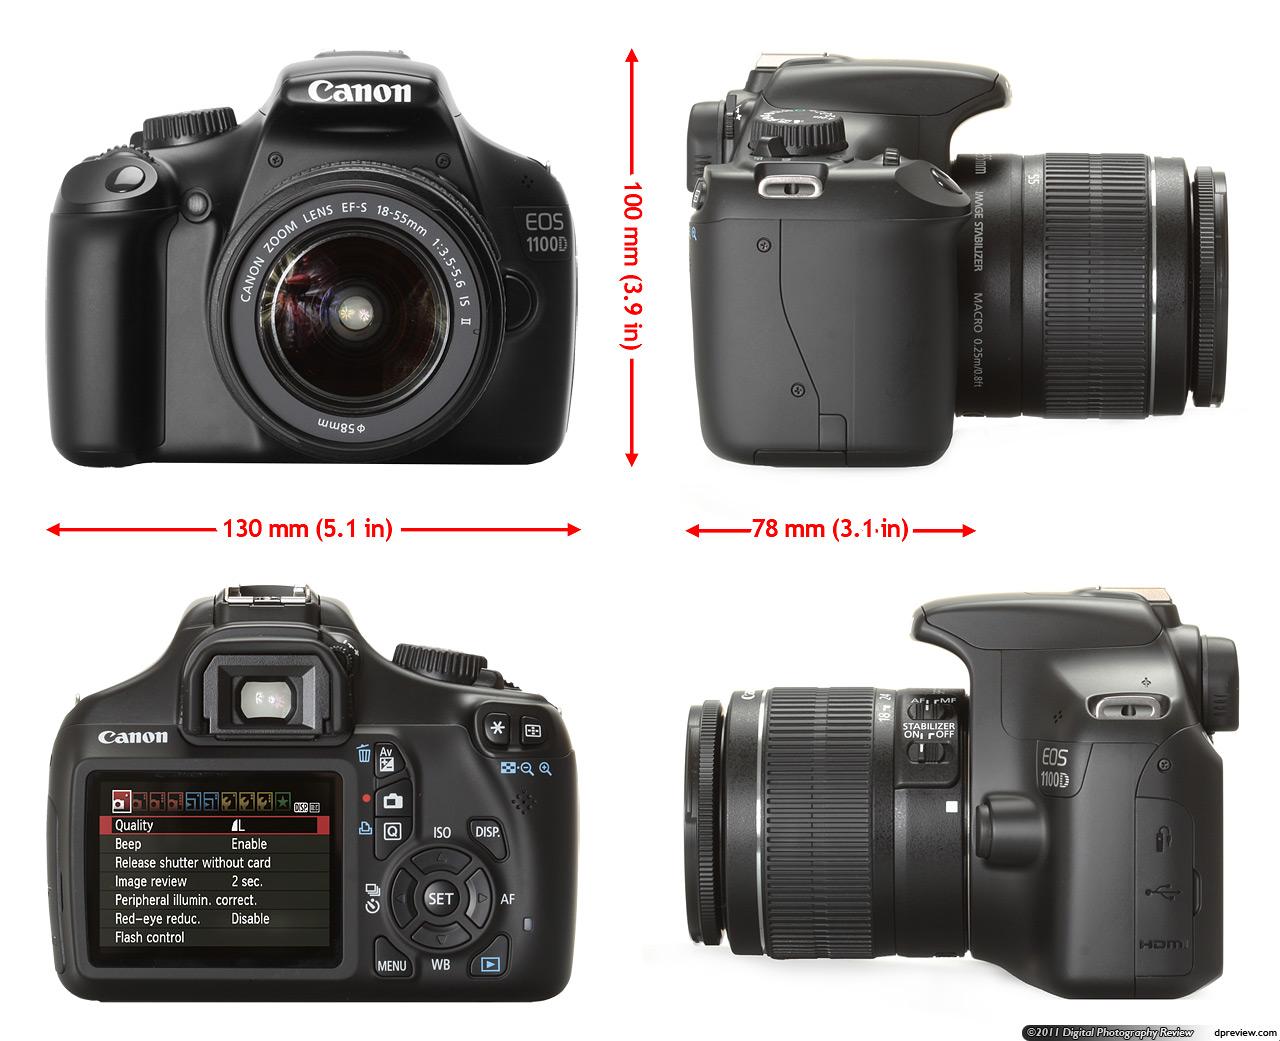 Camera Dslr Camera Canon 1100d canon 1100d brand new 01715914144 clickbd large image 0